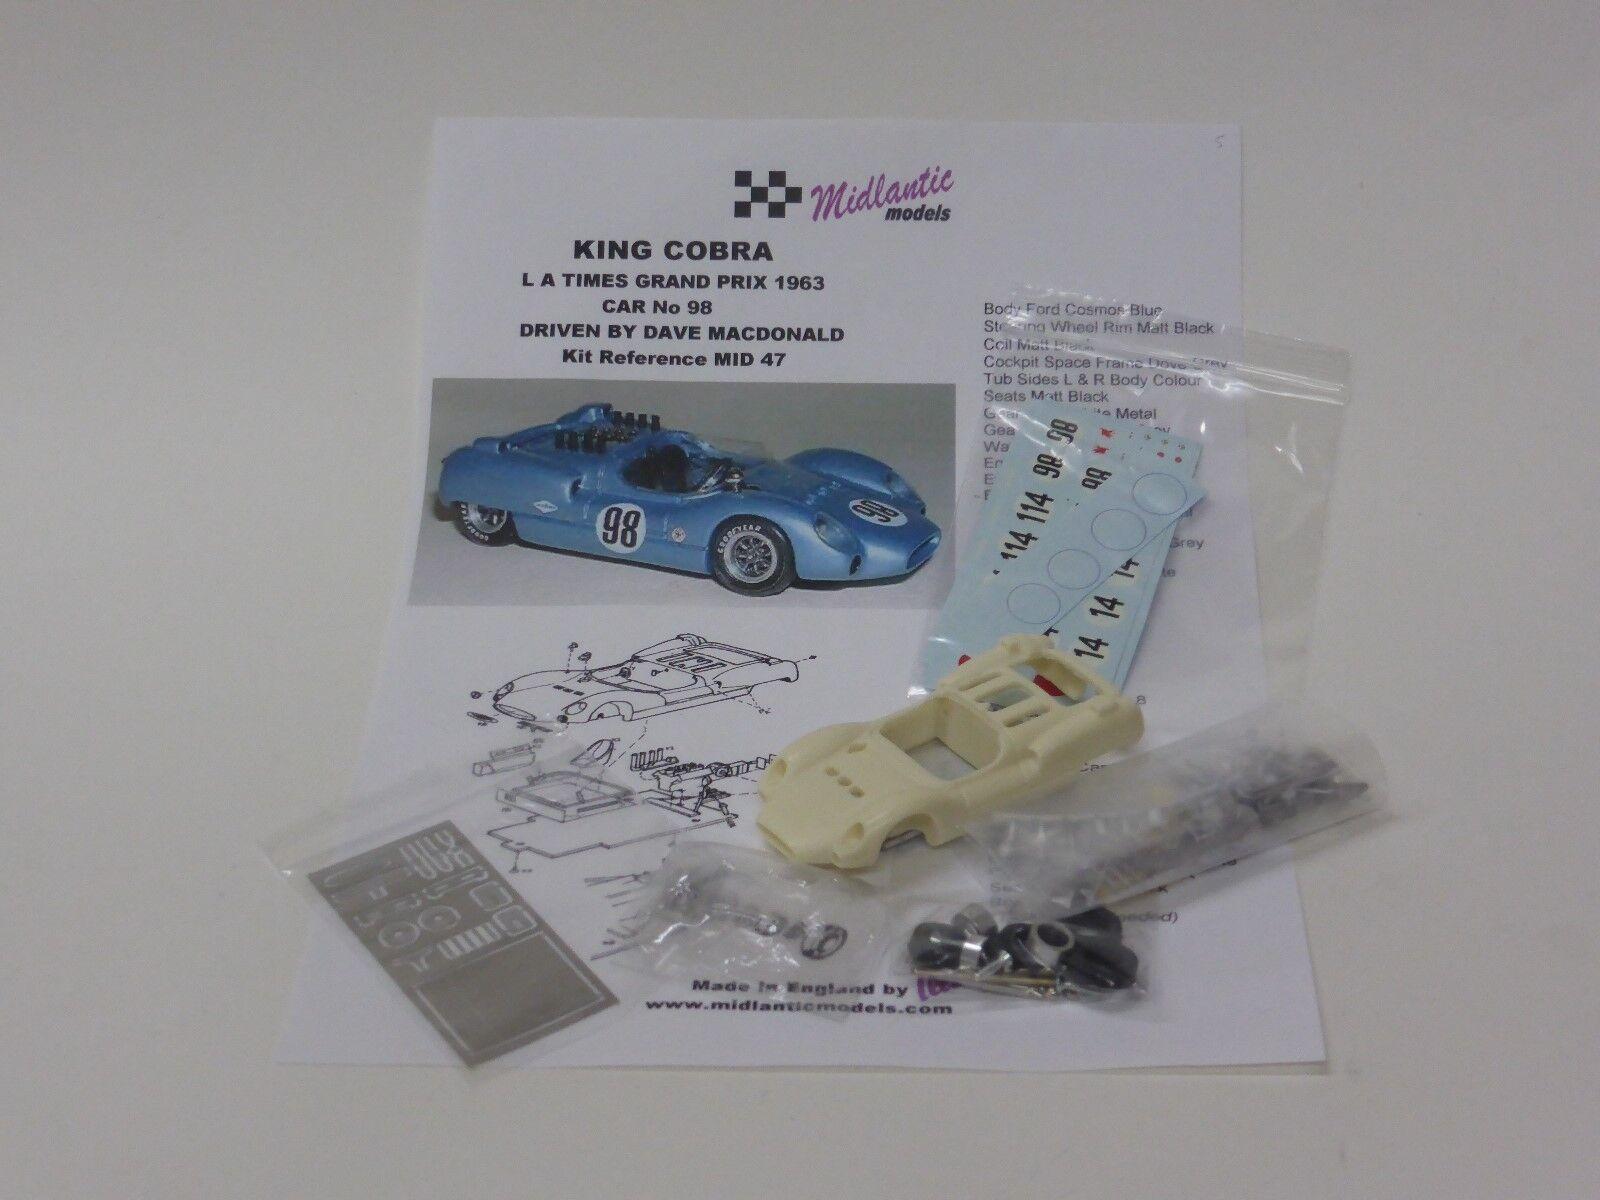 MID47 1 43 kit of 1963 King Cobra, car Dave MacDonald, Riverside not BBR